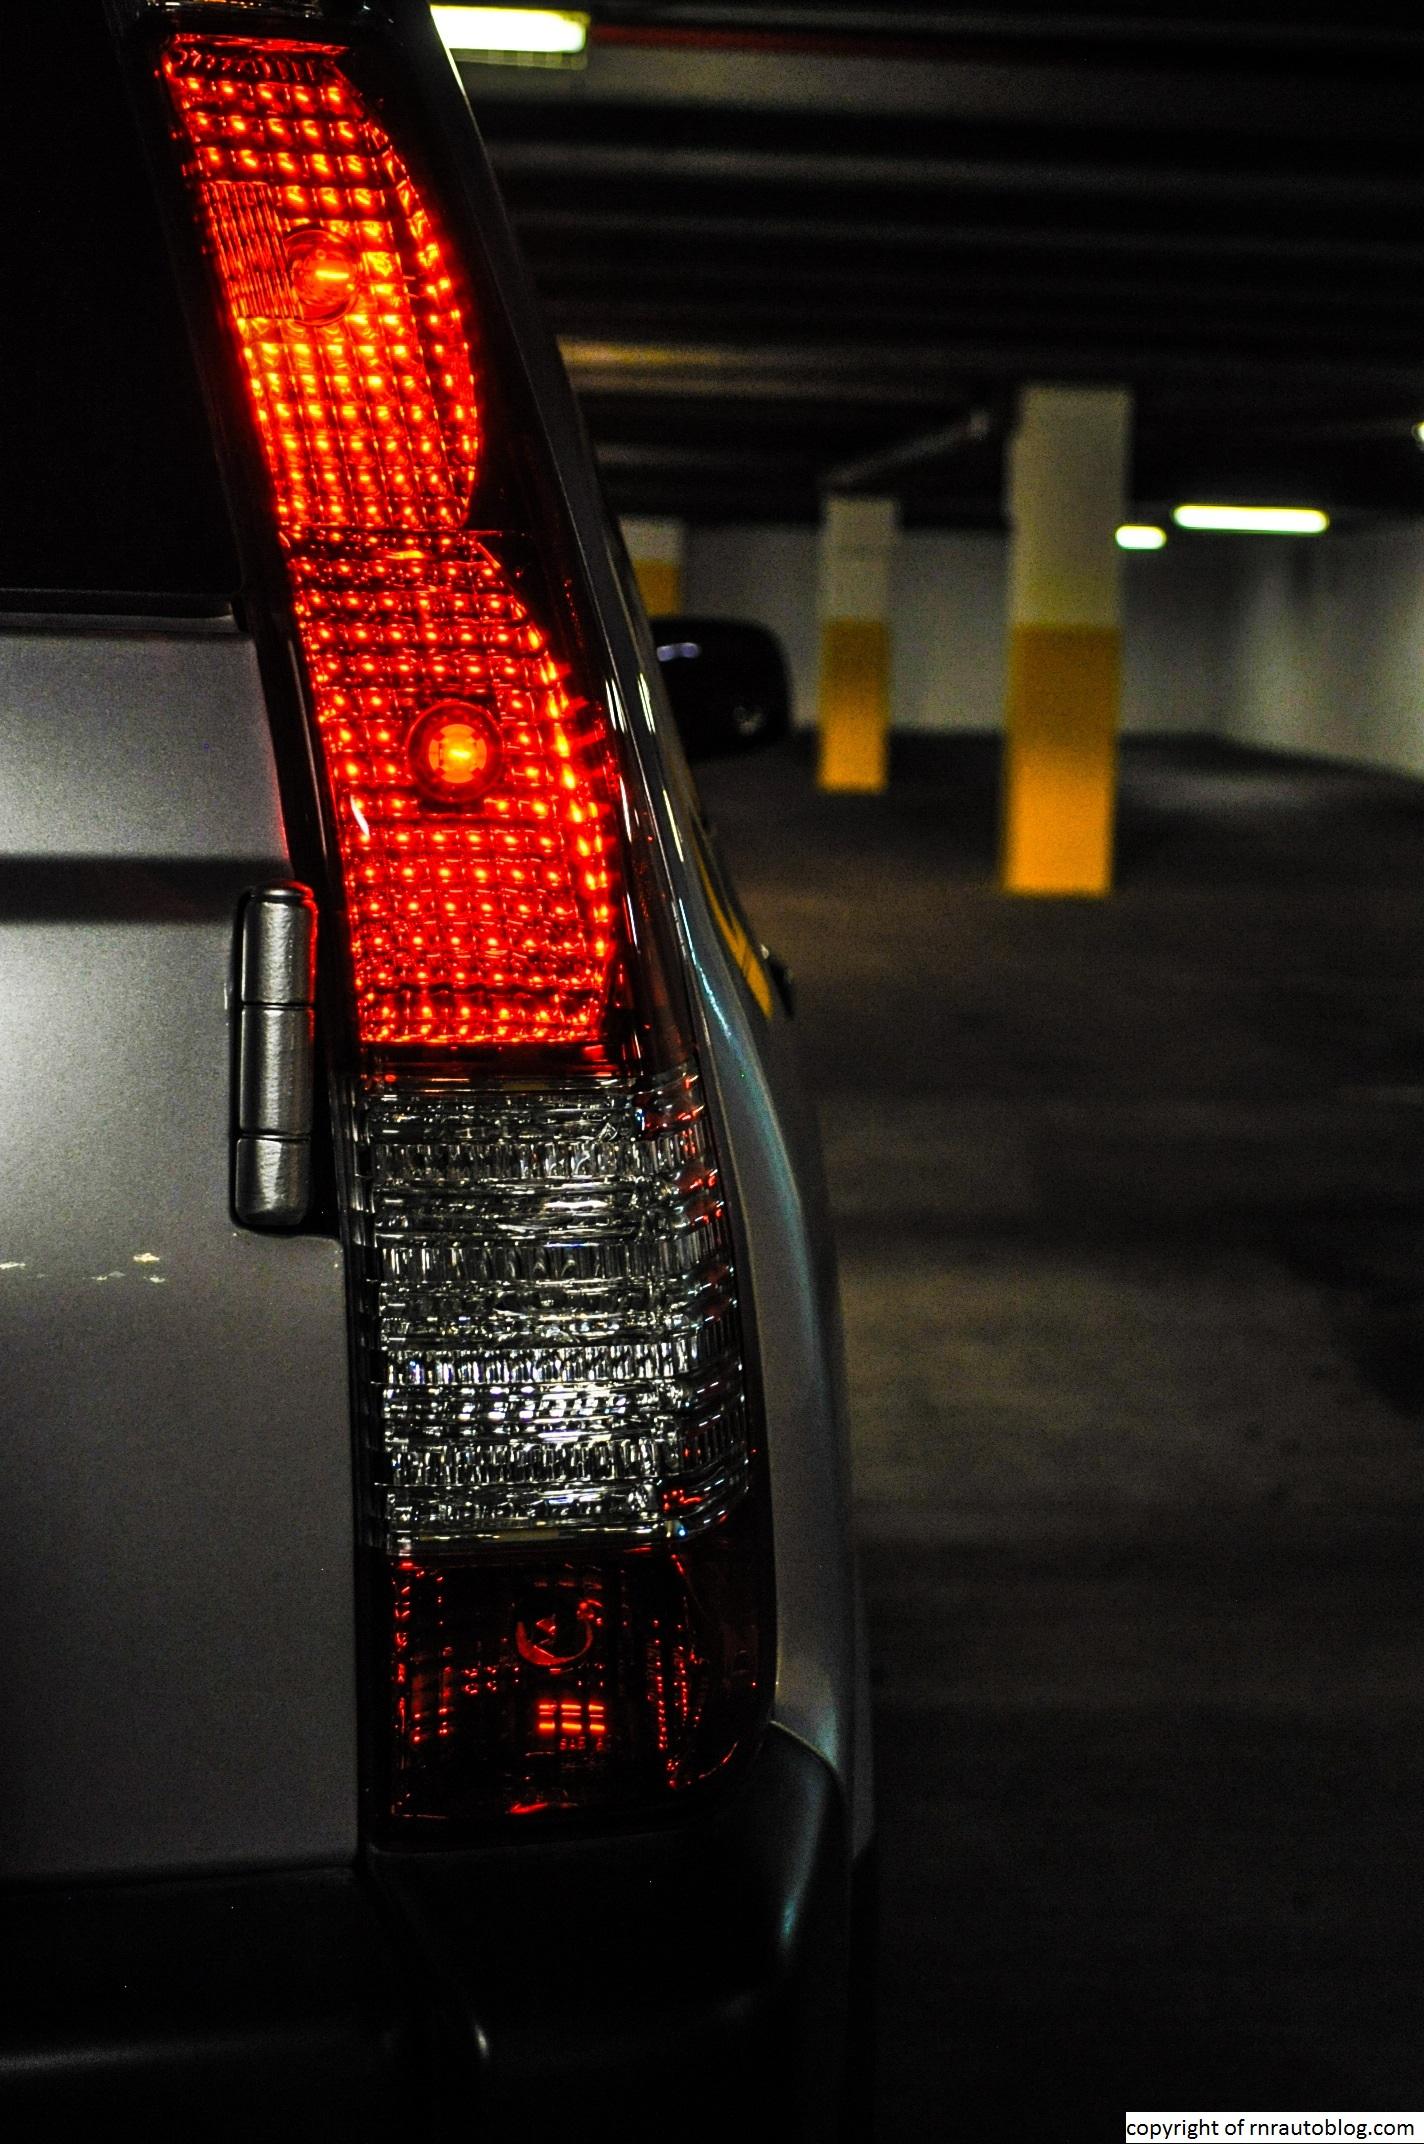 2006 Honda Cr V Brake Light Fuse Library Of Wiring Diagram Box Why Is My On Crv Best 2017 Rh Storesay Site 2010 2007